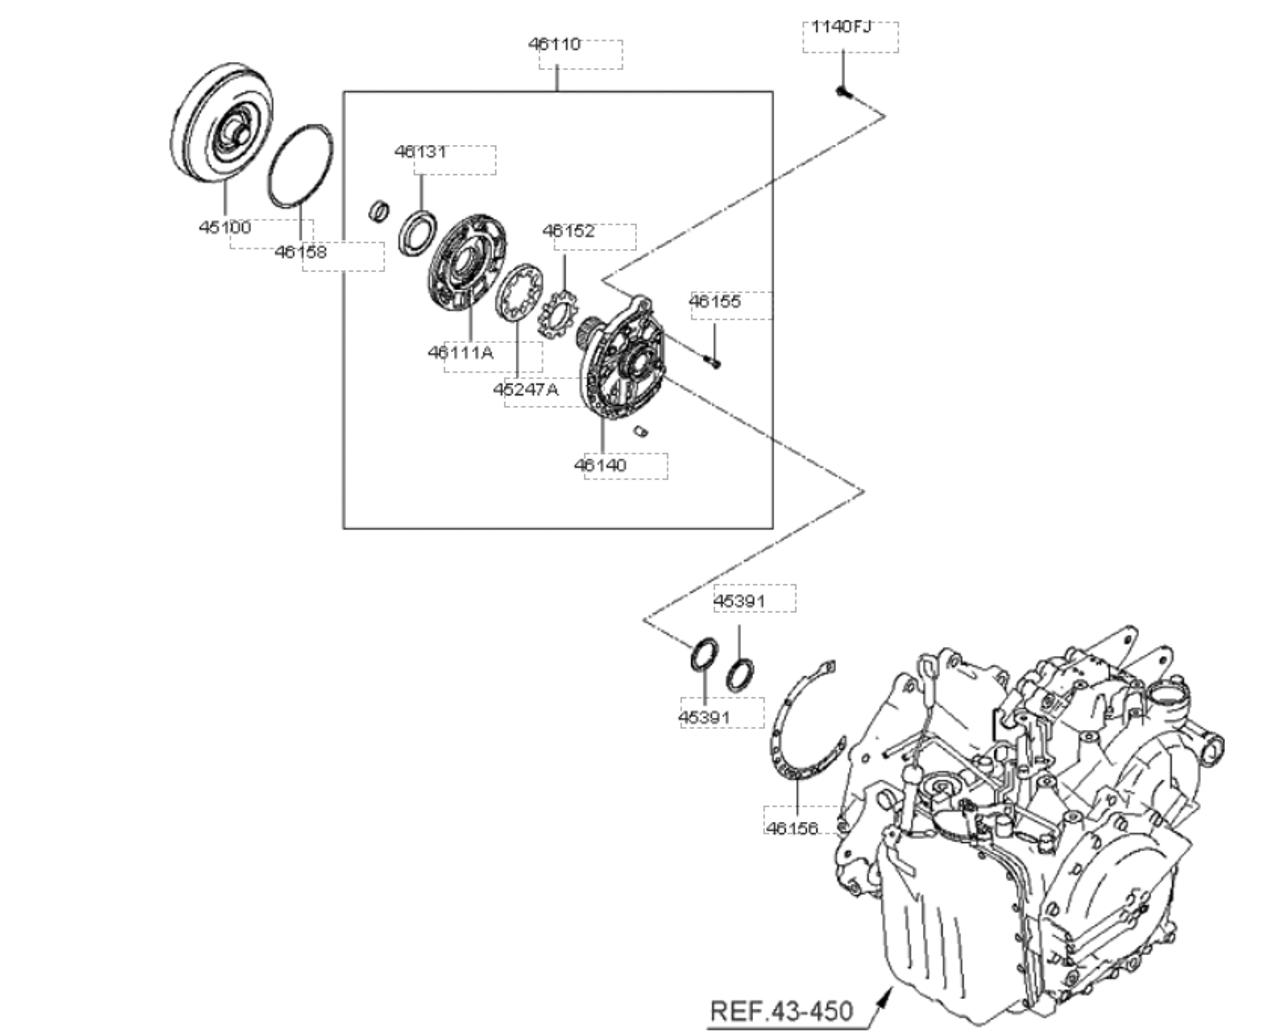 geuine converter assy torque 451003a200 for hyundai grandeur tg azera 2006 2010  [ 1280 x 1033 Pixel ]